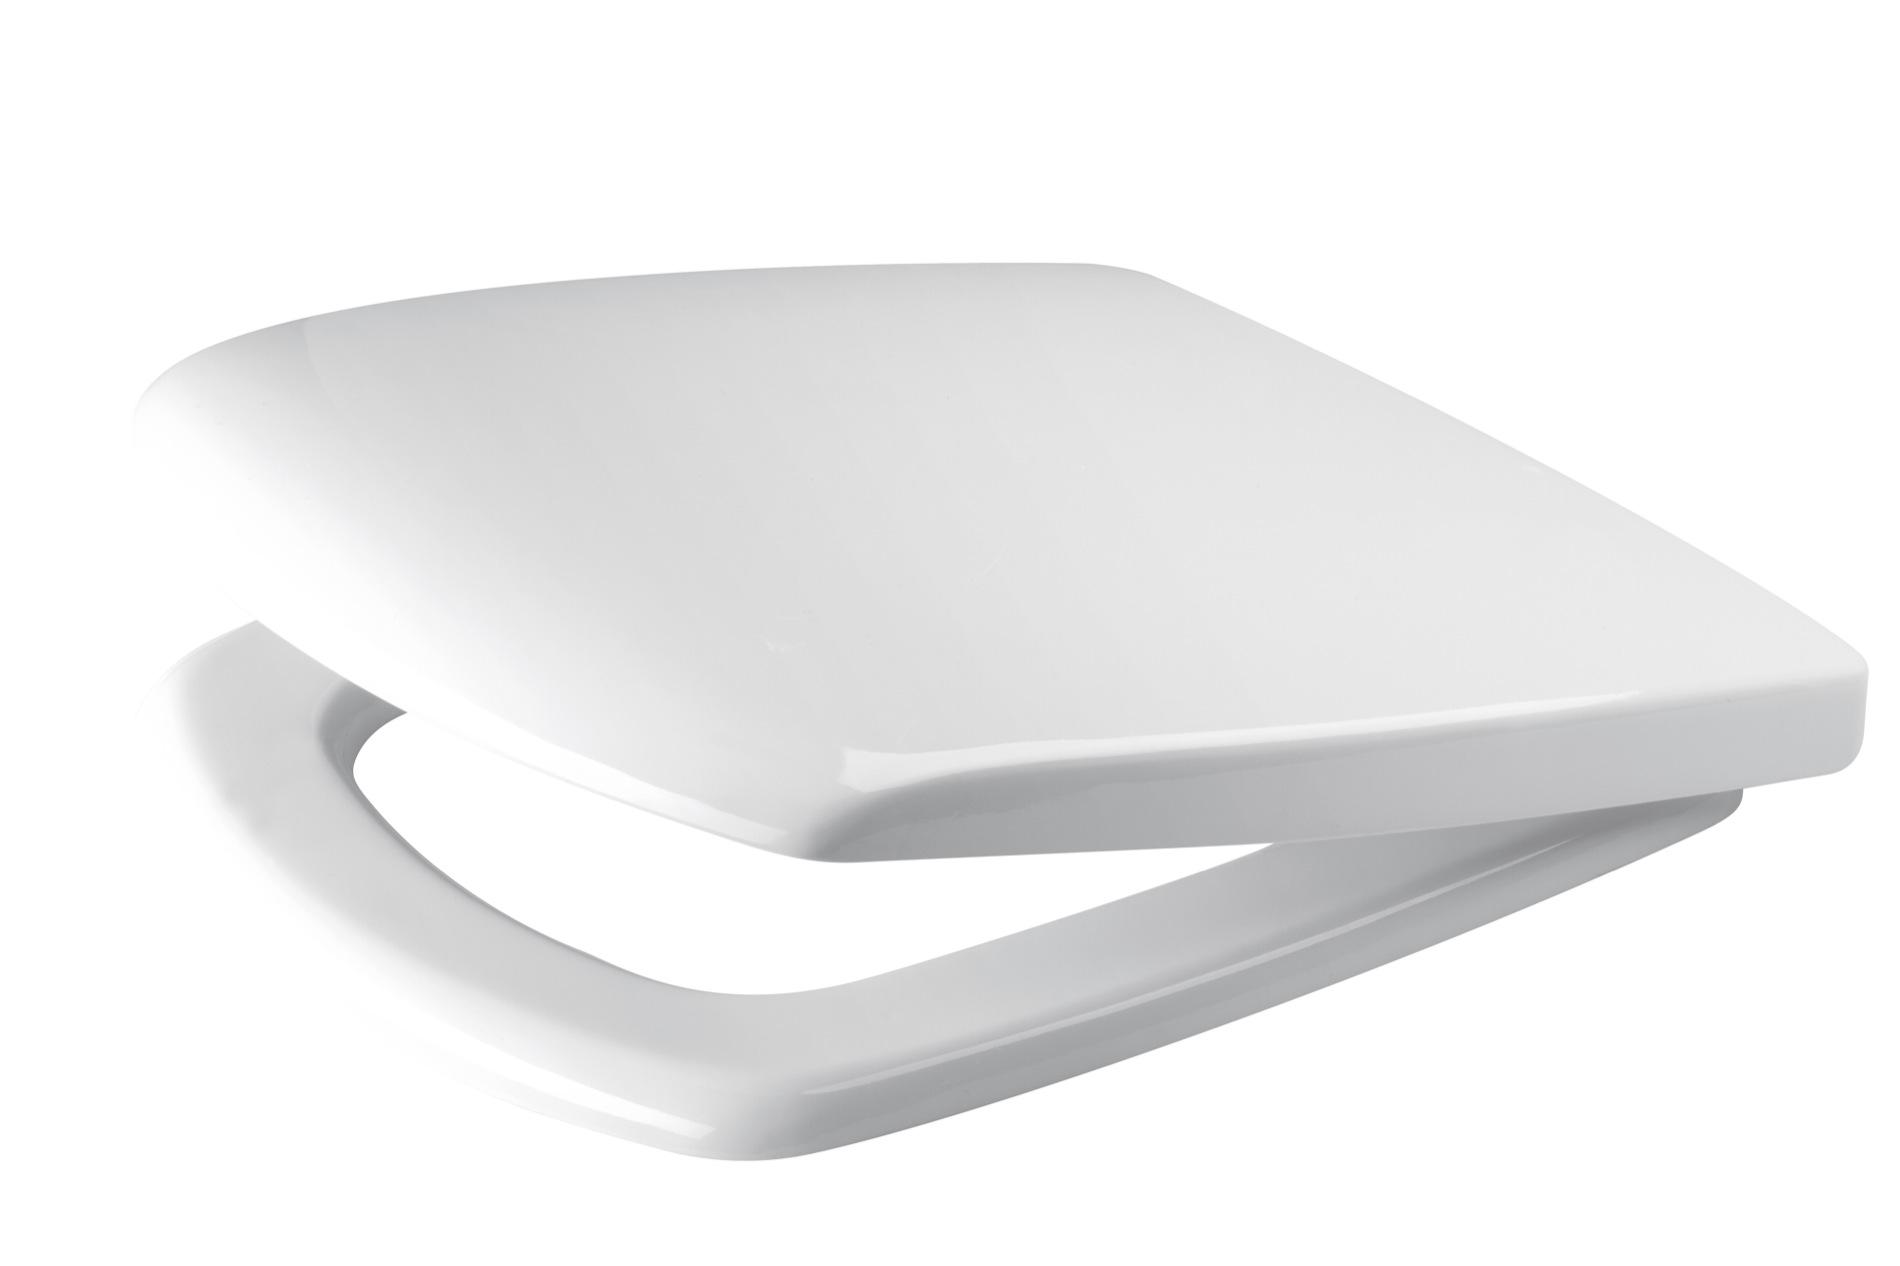 Cersanit Carina toilet seat, soft-close, white (K98-0069)